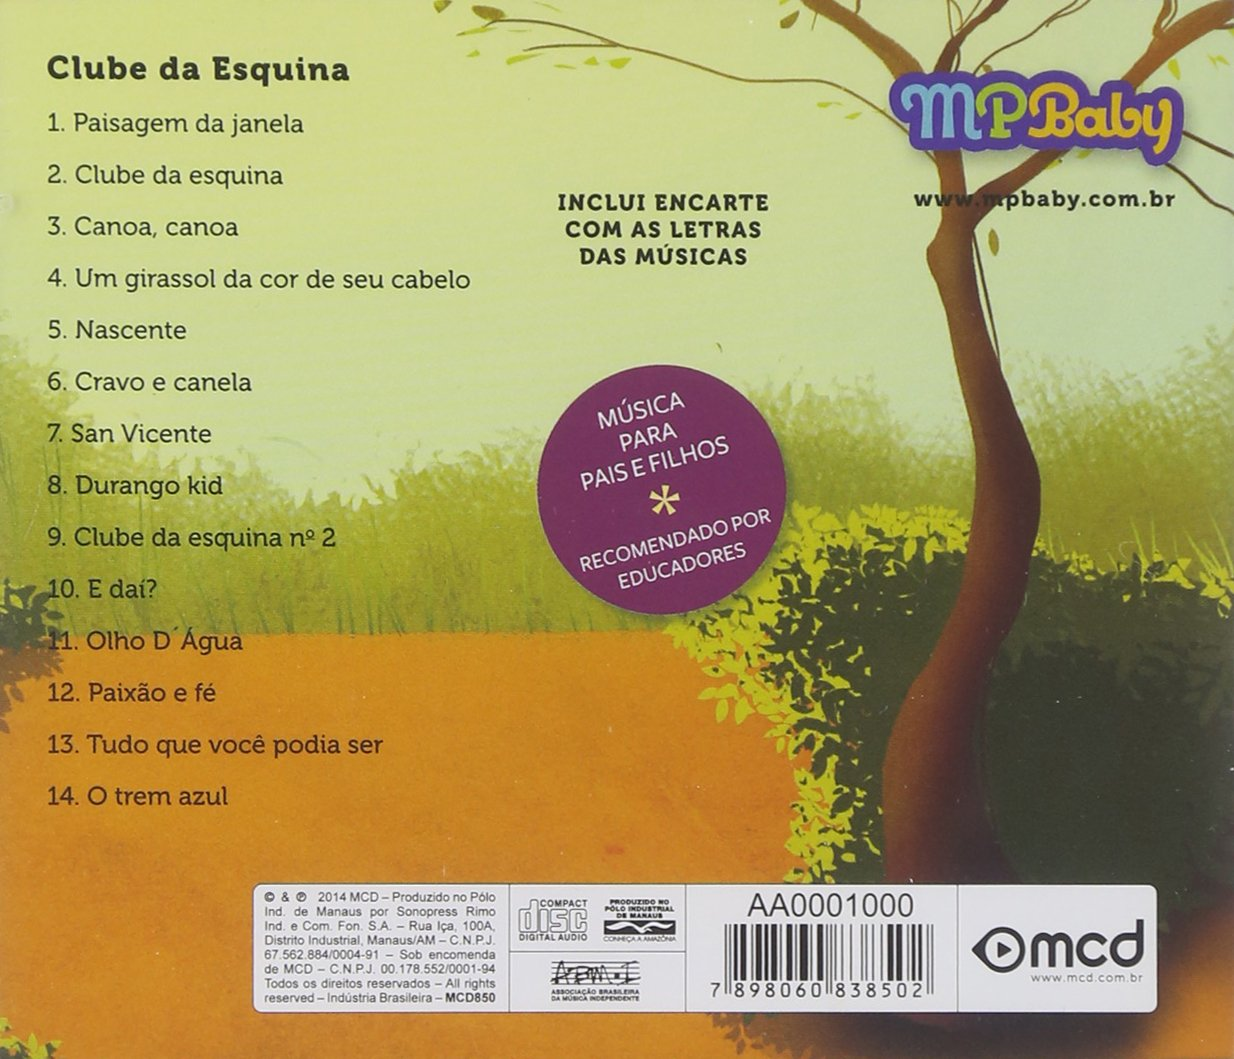 Bia&Nino (Mpbaby) - Mpbaby: Clube Da Esquina - Amazon com Music